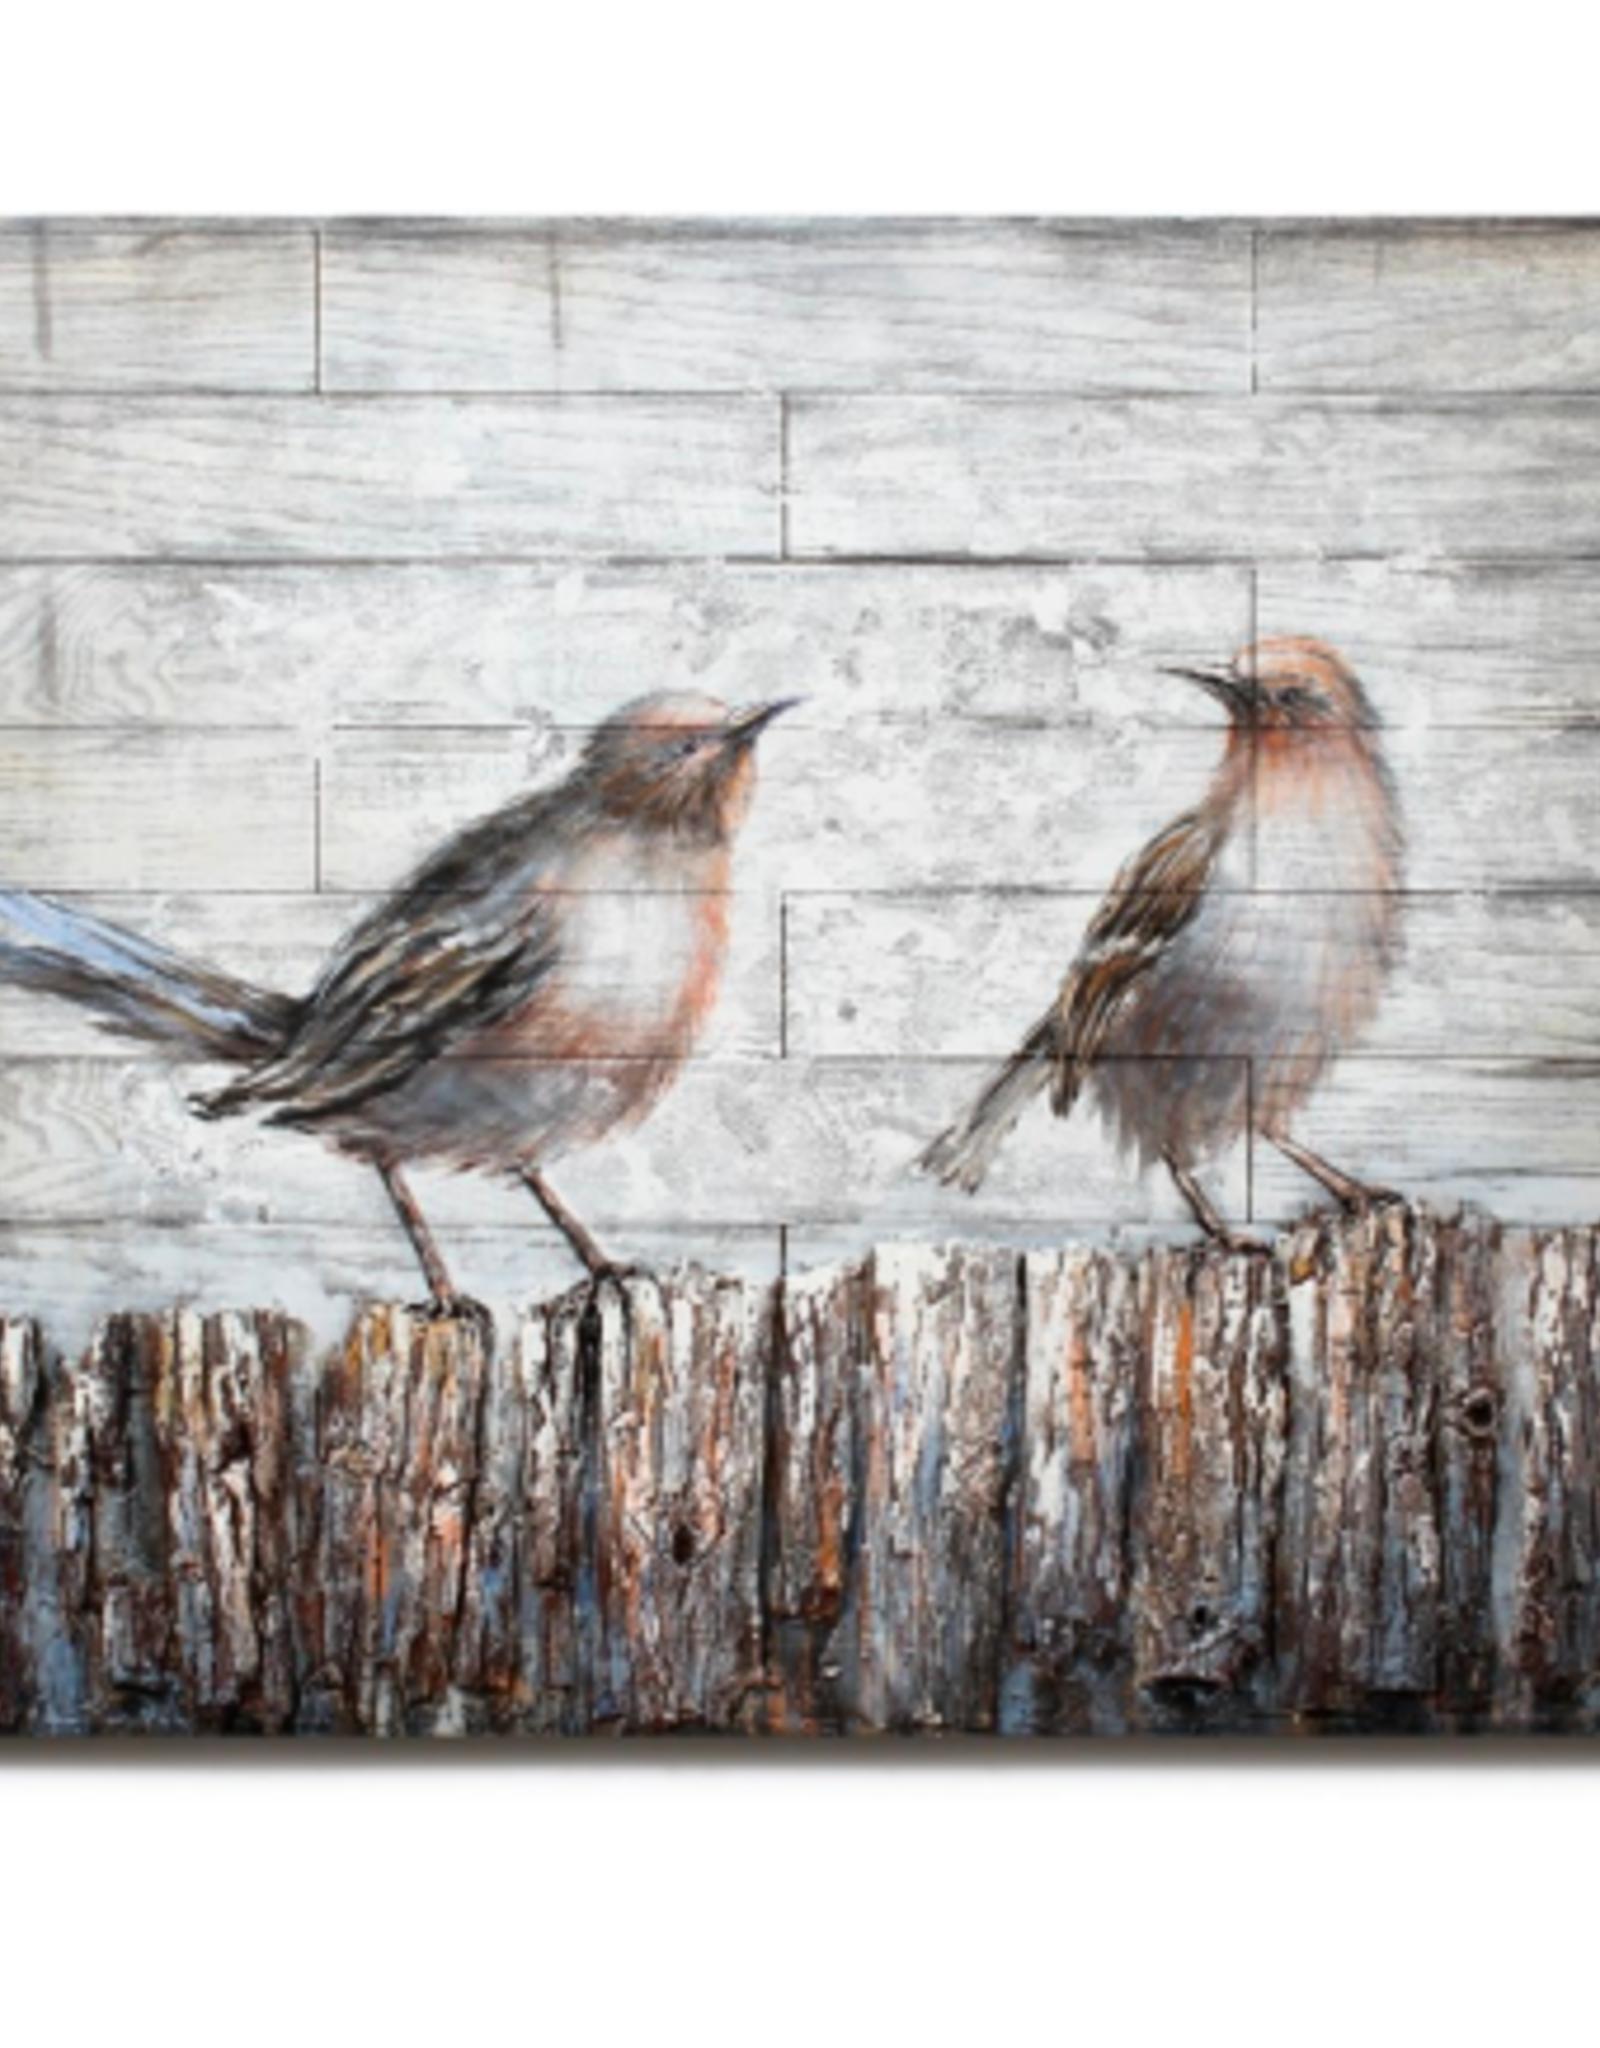 Art CJ 2 Birds on Fence